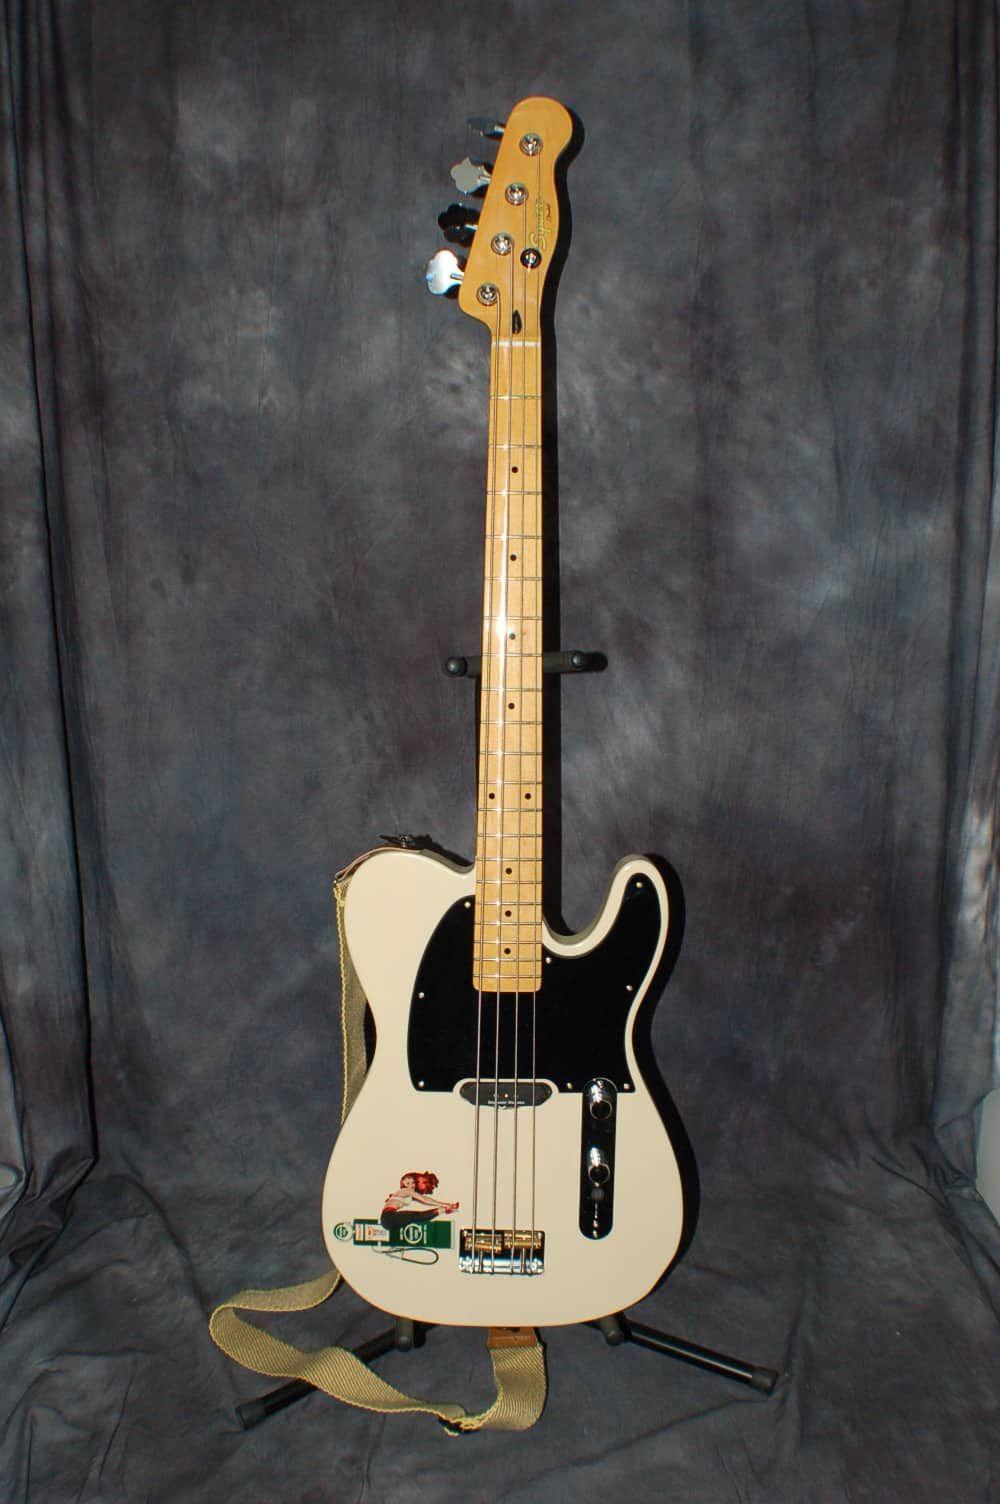 2013 Fender Squire 50 S Vintage Modified Telecaster Bass Seymor Duncan Pickup Gigbag Lawman Guitars Reverb Telecaster Bass Guitar Fender Squire